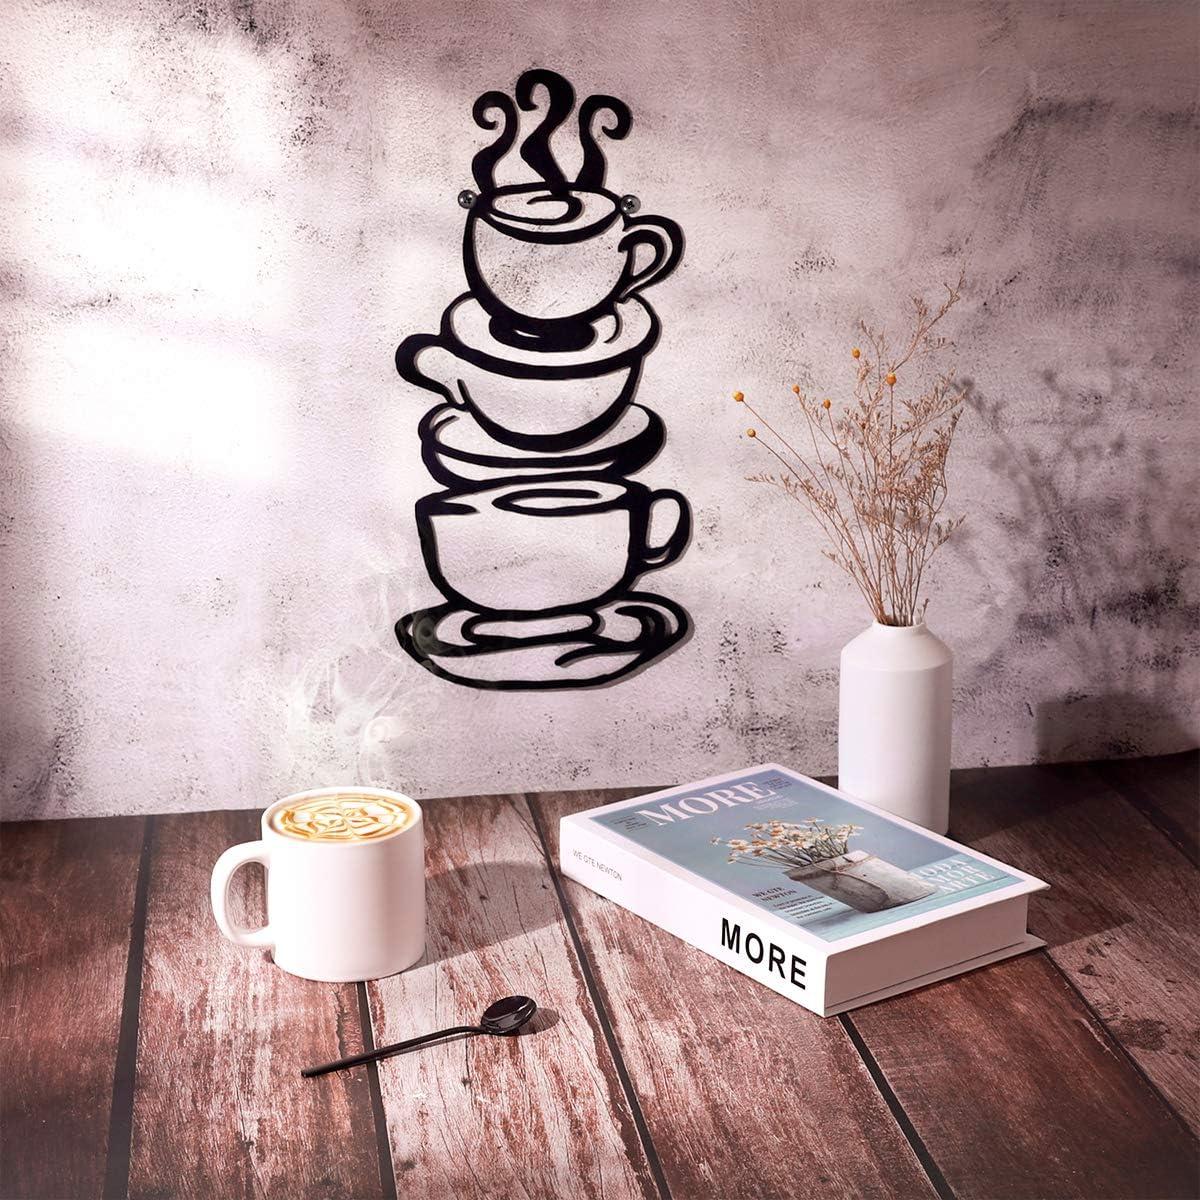 Farmhouse Kitchen Restaurant Decor Coffee Bar Sign Coffee Cup Metal Wall Art Black